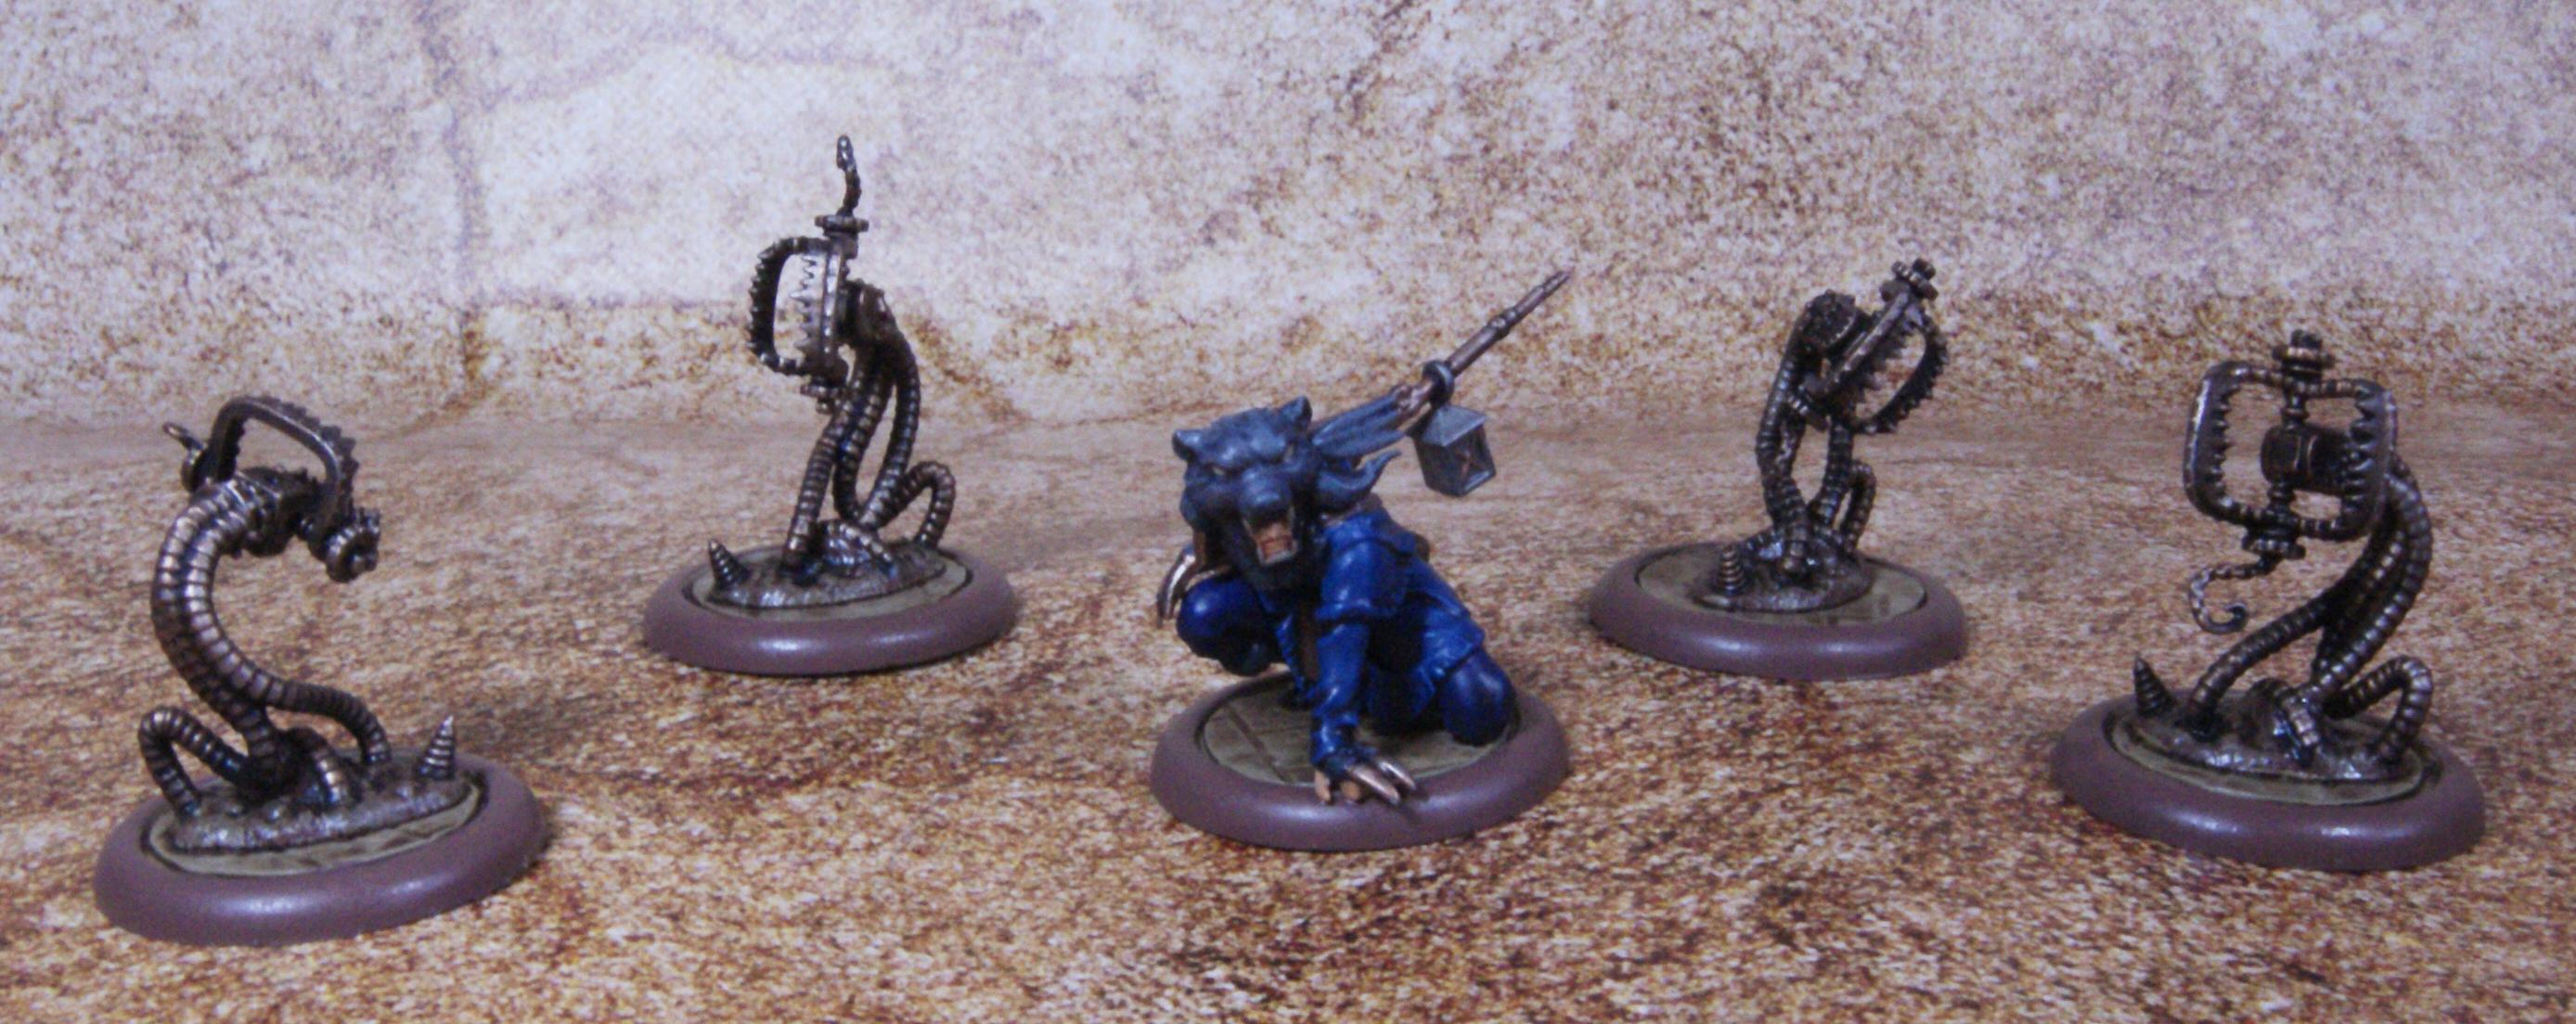 Guild, Malifaux, Pathfinders, Traps